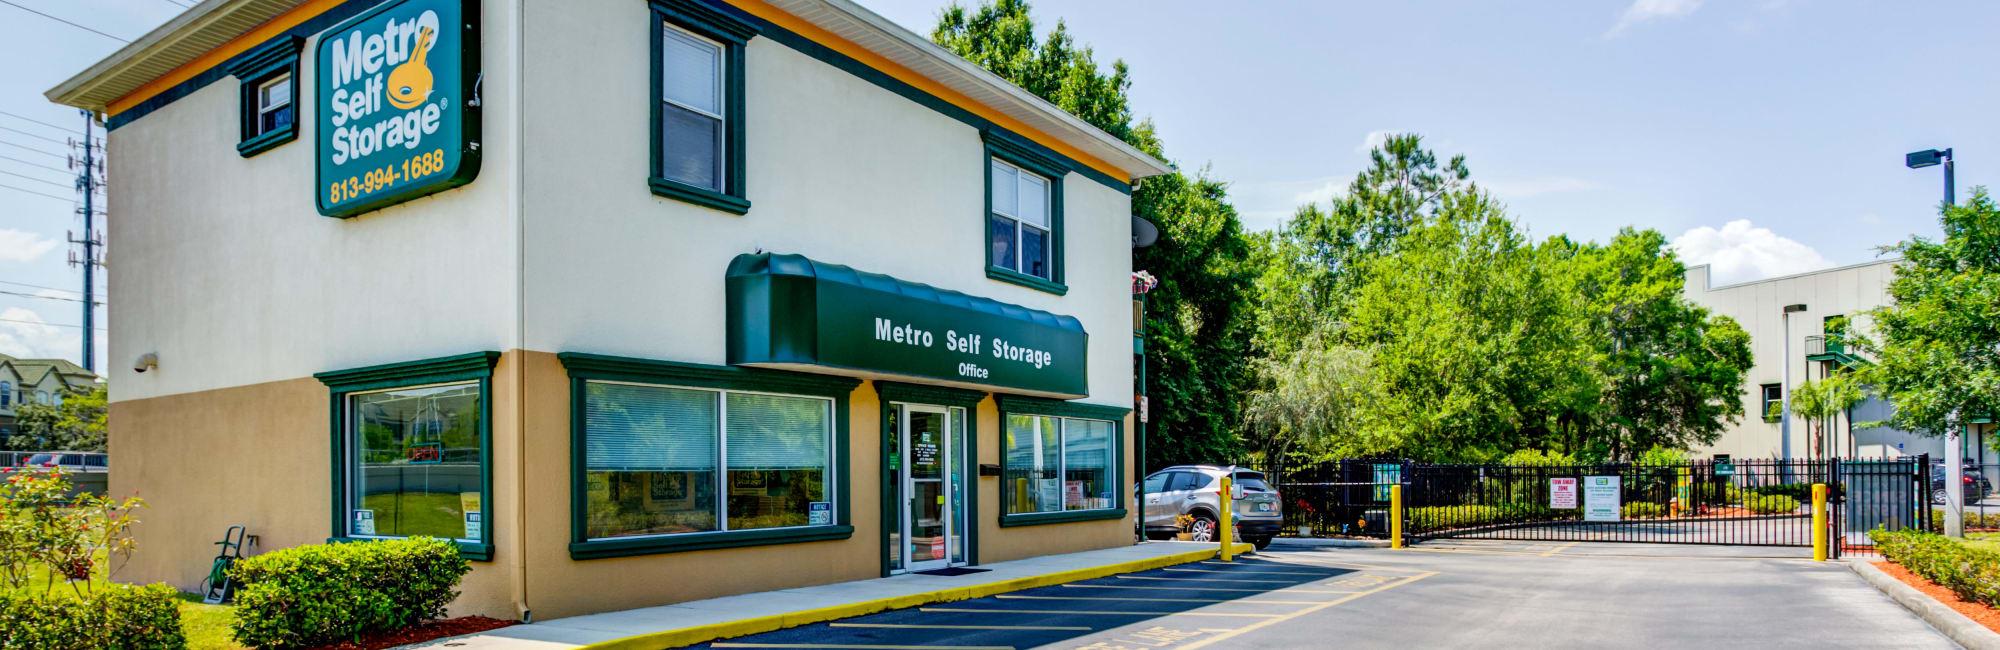 Attrayant Metro Self Storage In Tampa, FL